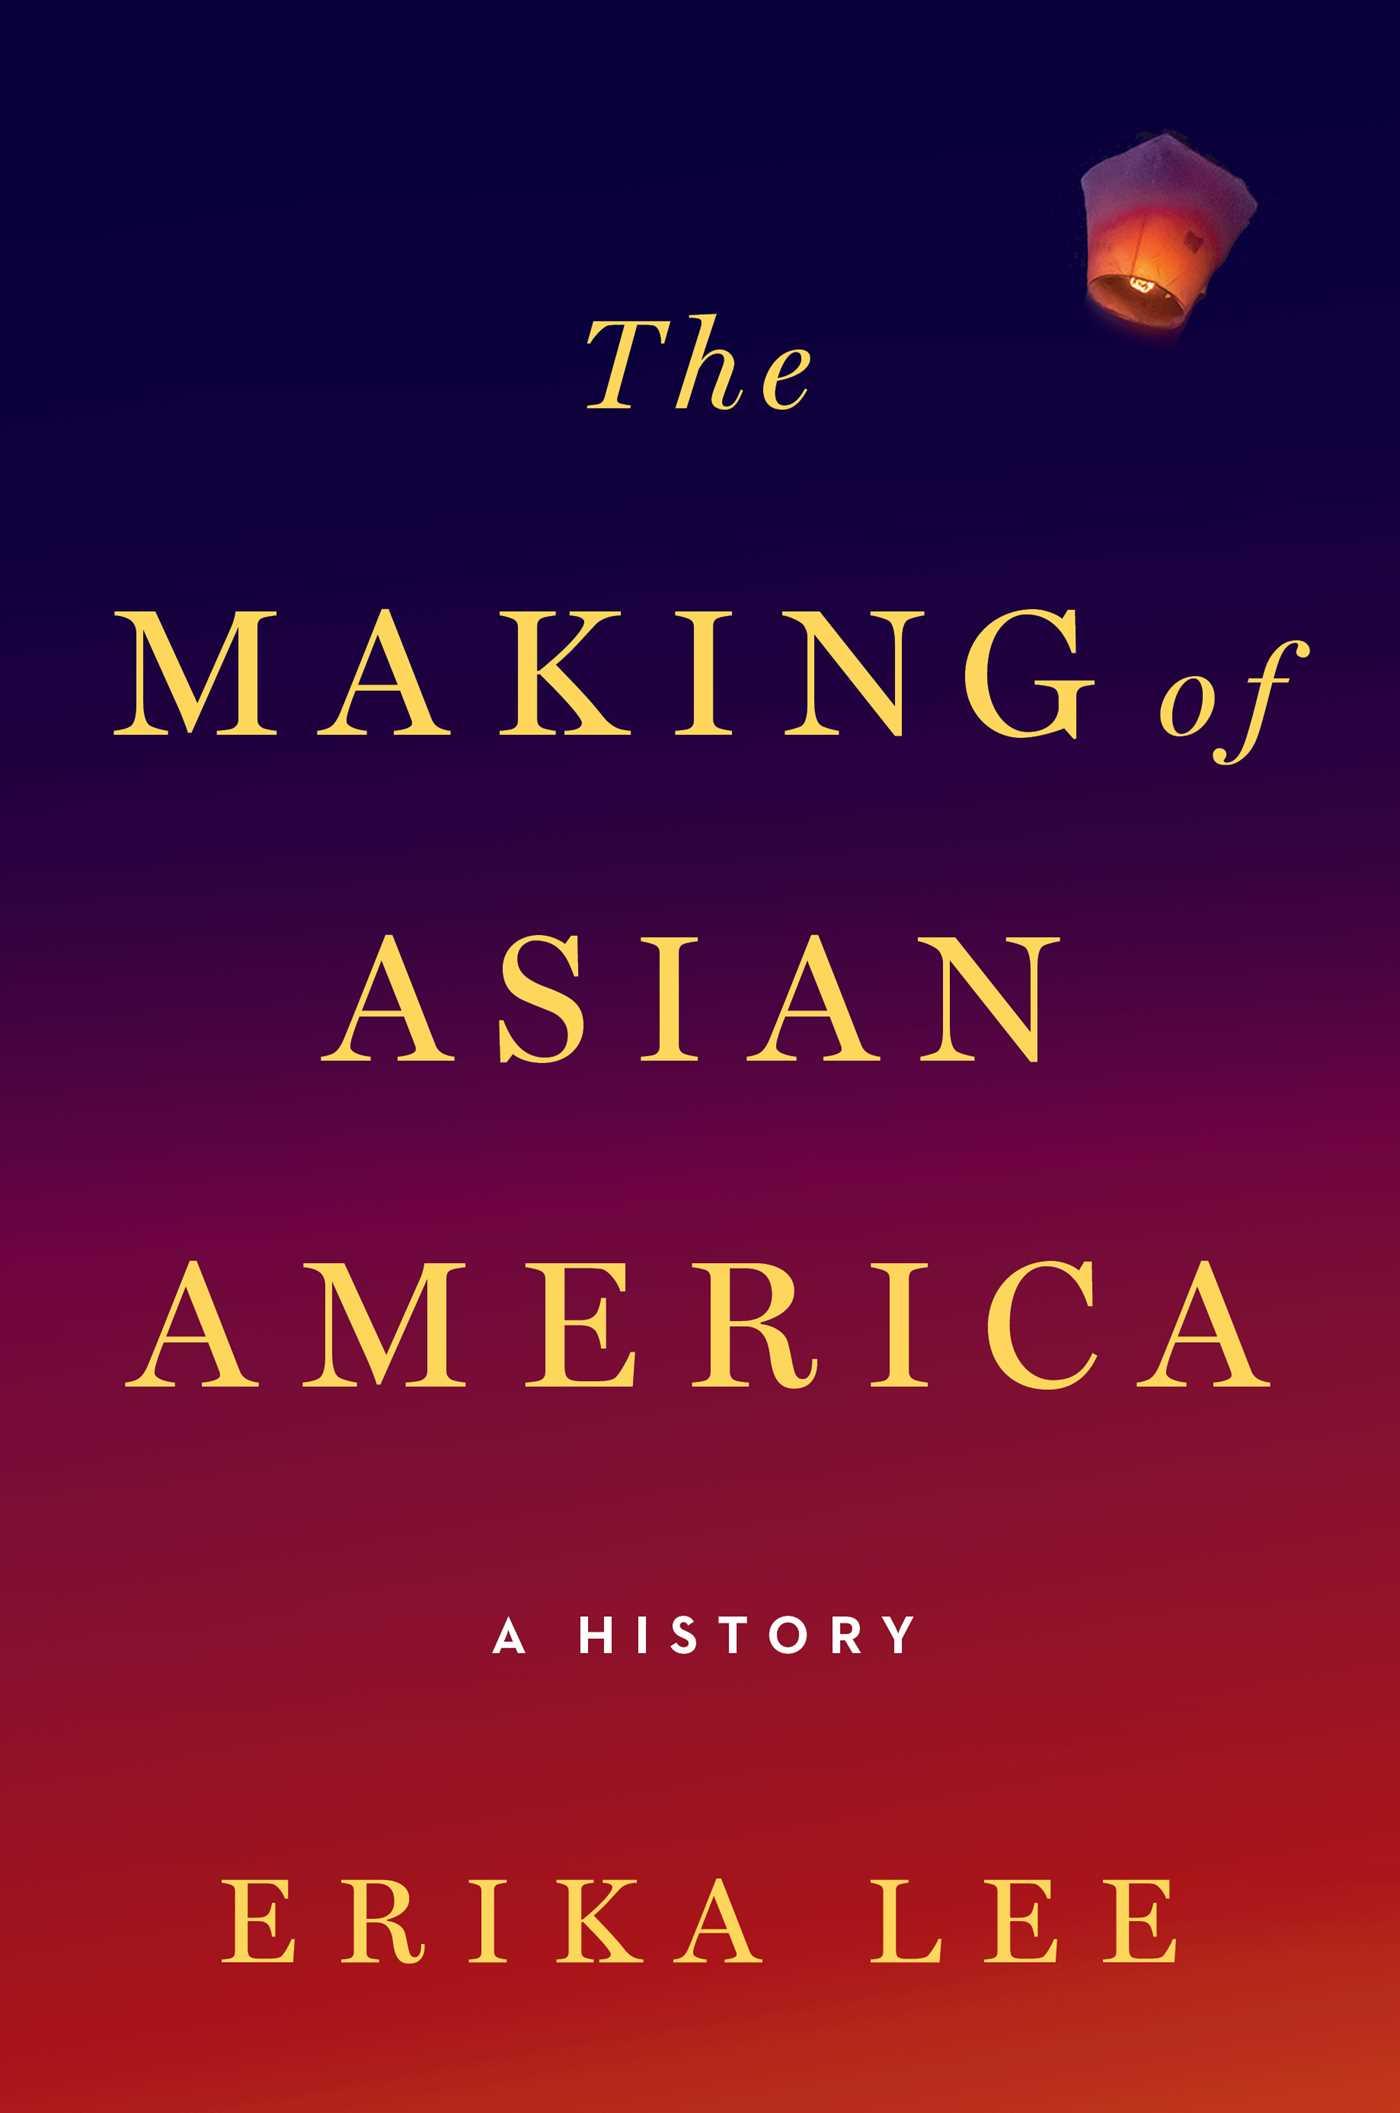 the-making-of-asian-america-9781476739403_hr.jpg